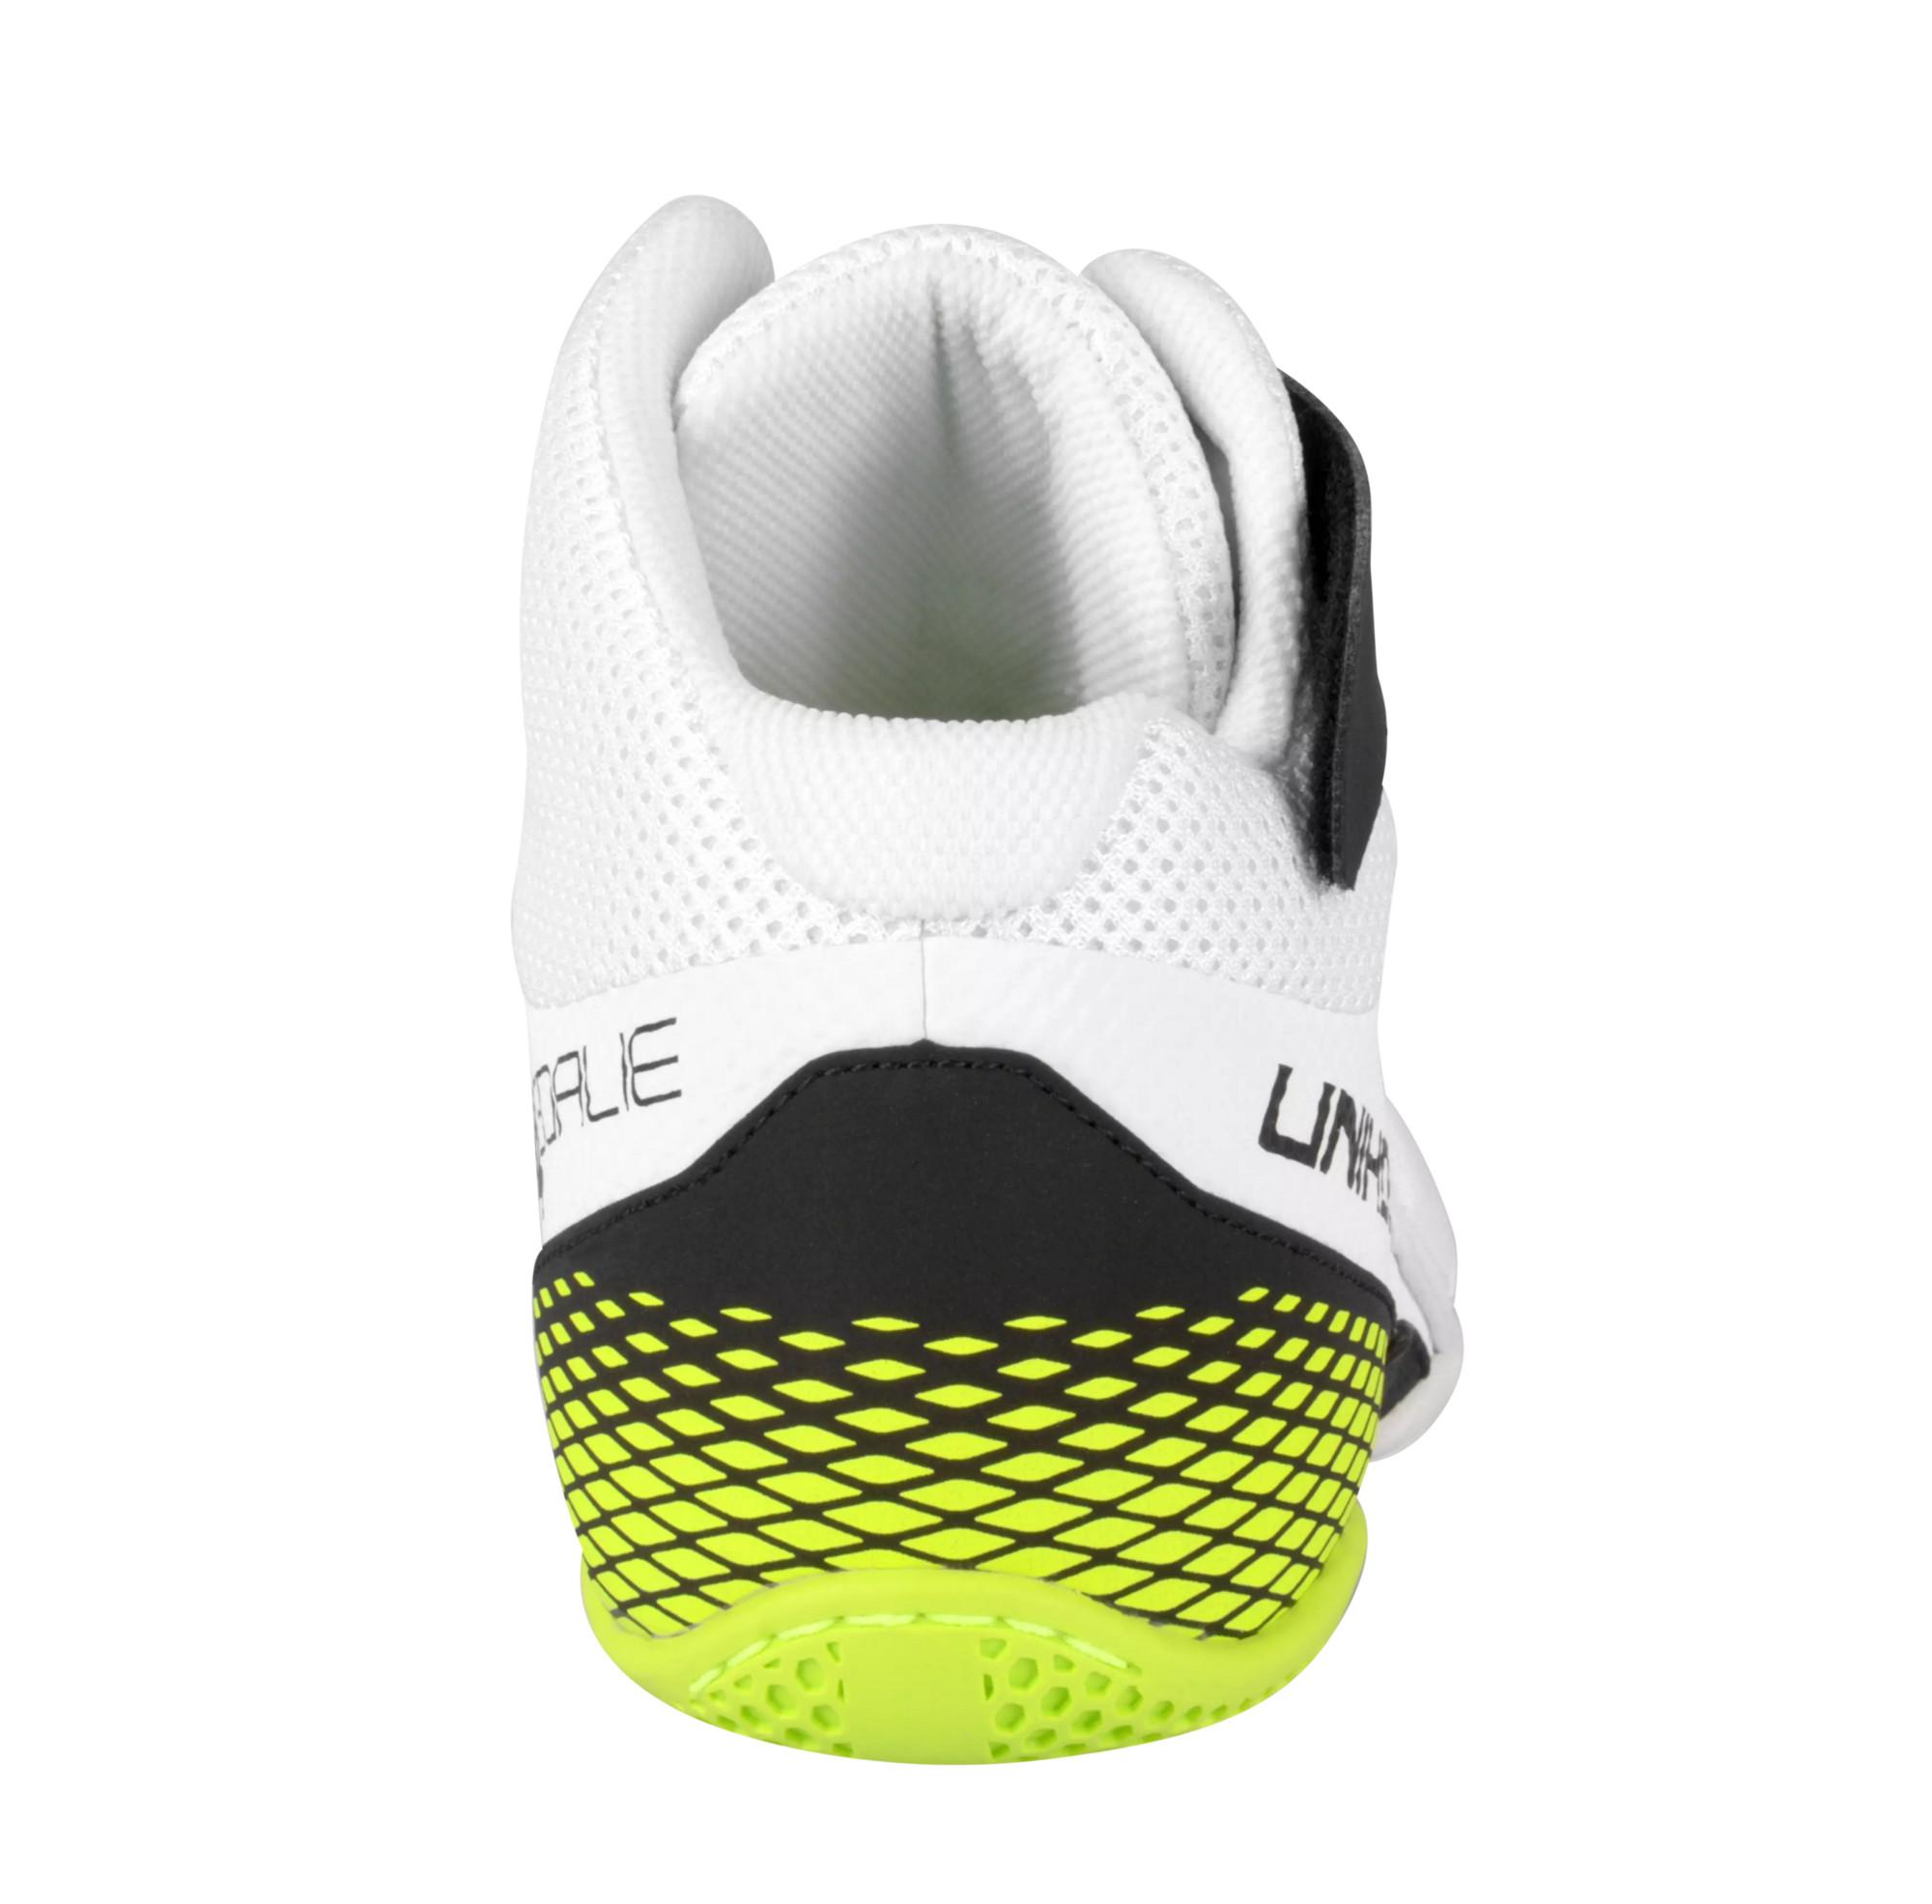 519aa2da54e Unihoc U4 Goalie white neon yellow Brankářská sálová obuv